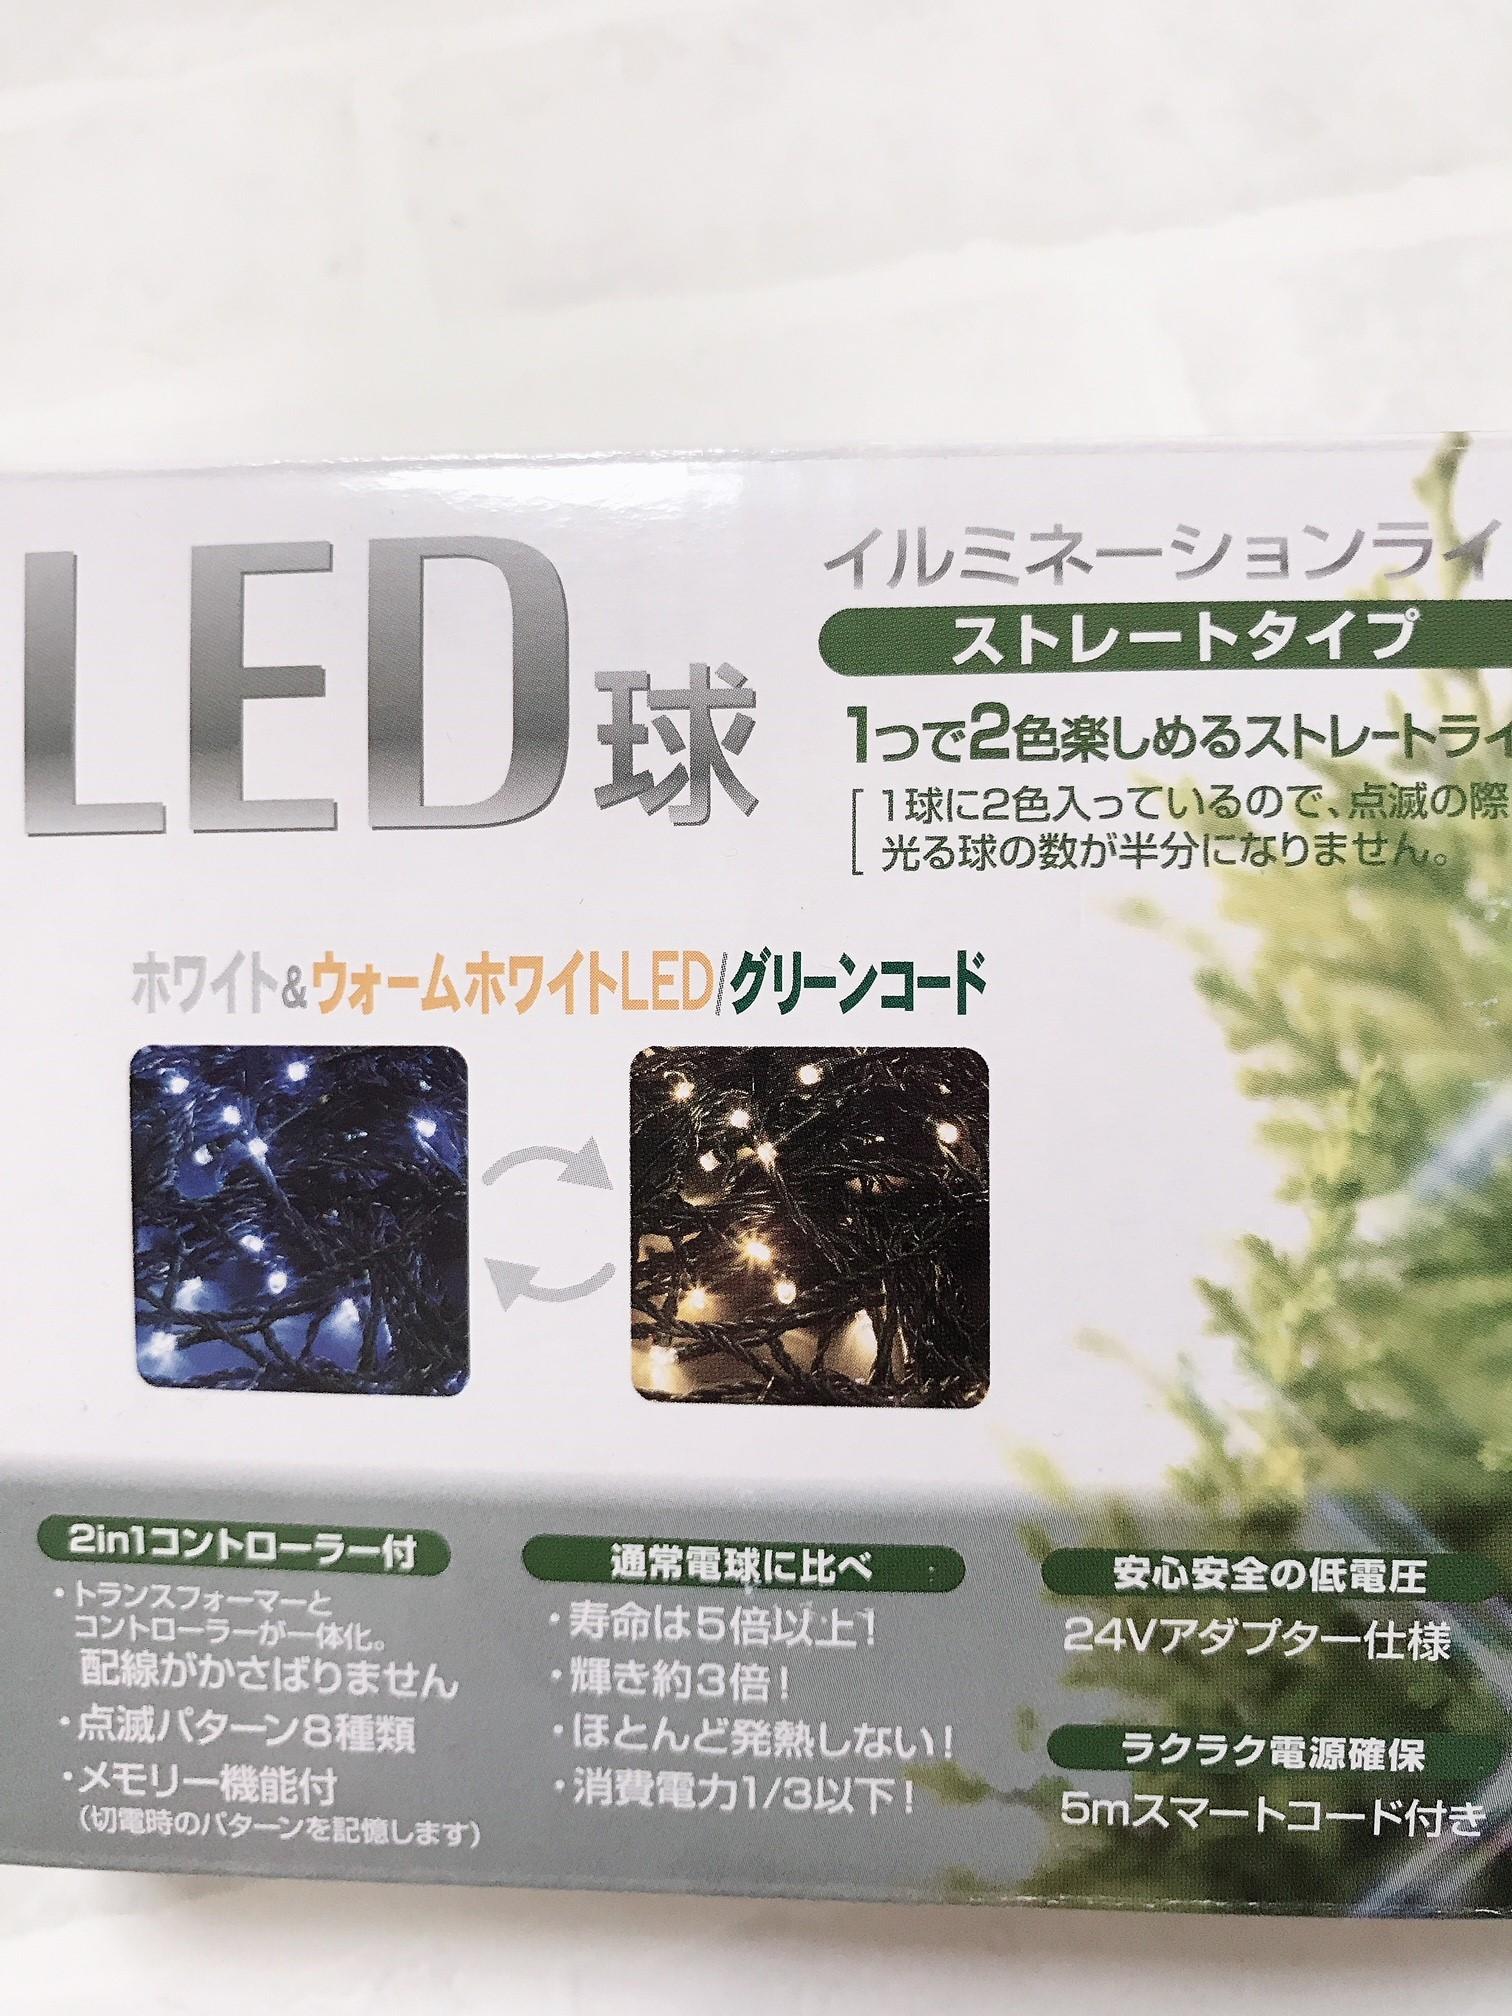 SALE! LEDイルミネーションライト 100球 10m ストレートタイプ ホワイト&ウォームホワイト